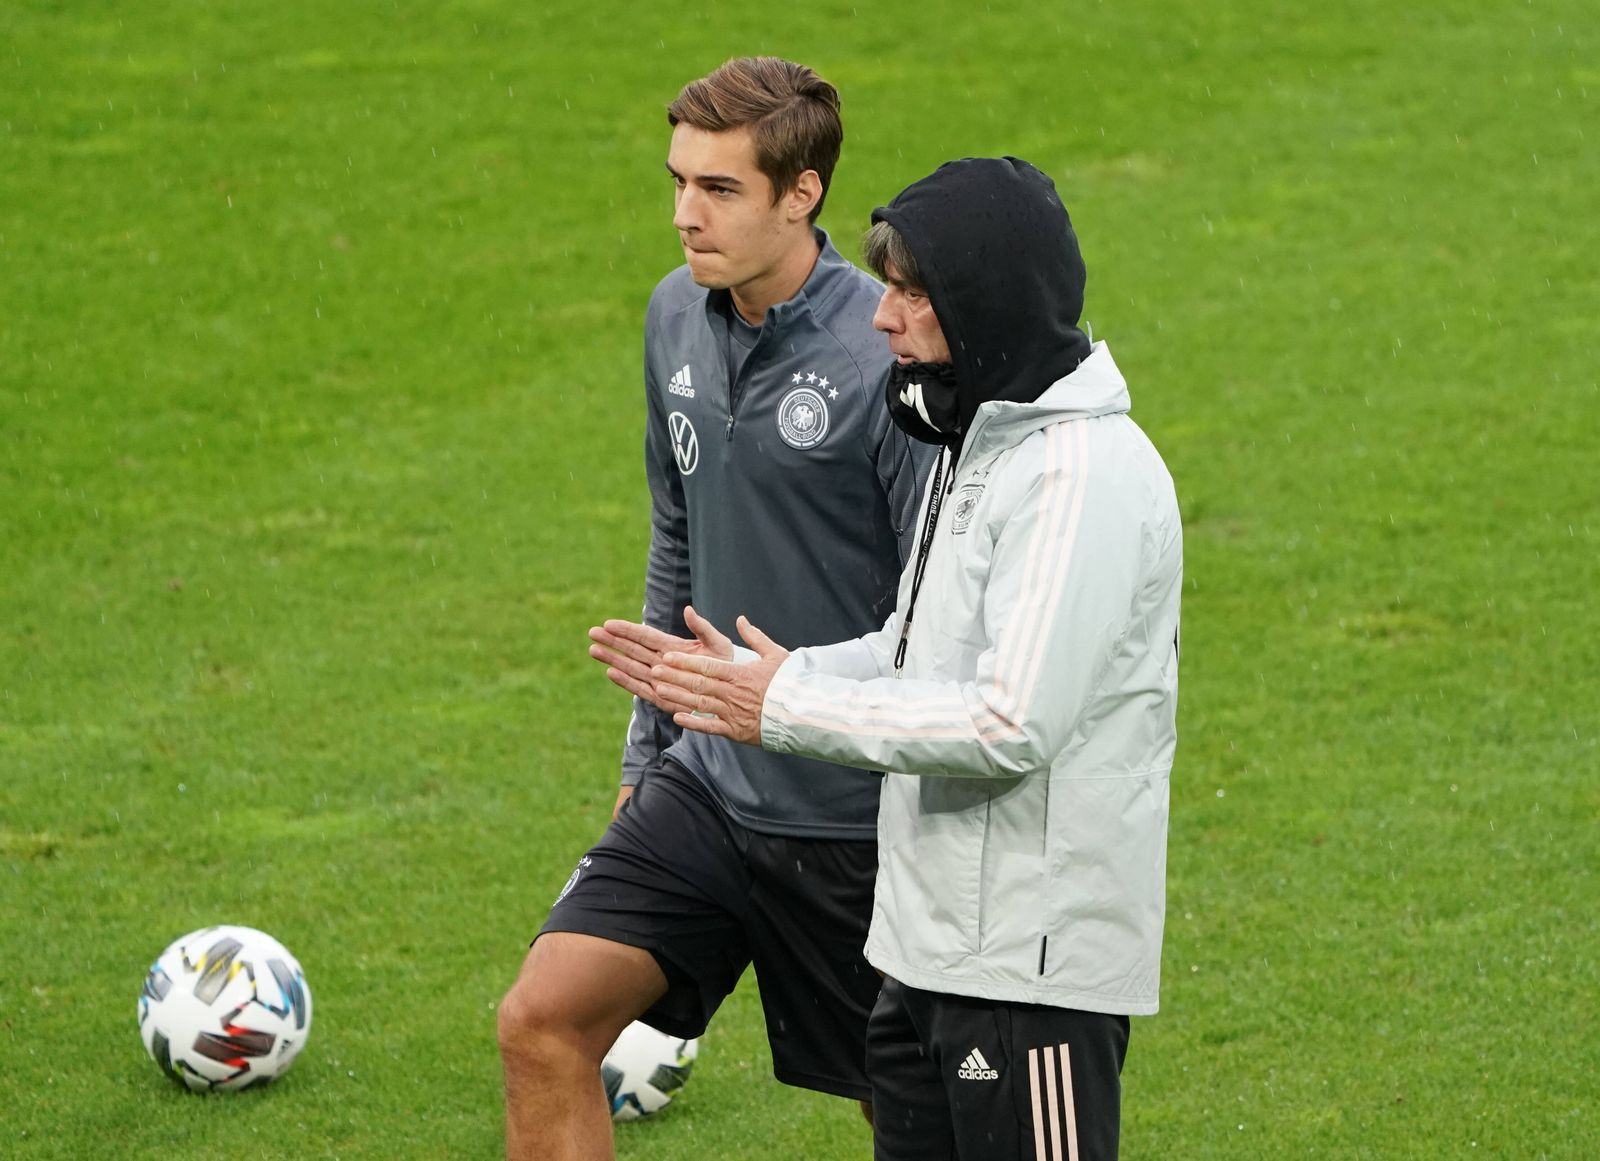 Bundestrainer Joachim Loew (Deutschland Germany) mit Florian Neuhaus (Deutschland Germany) - 06.10.2020: Abschlusstrain